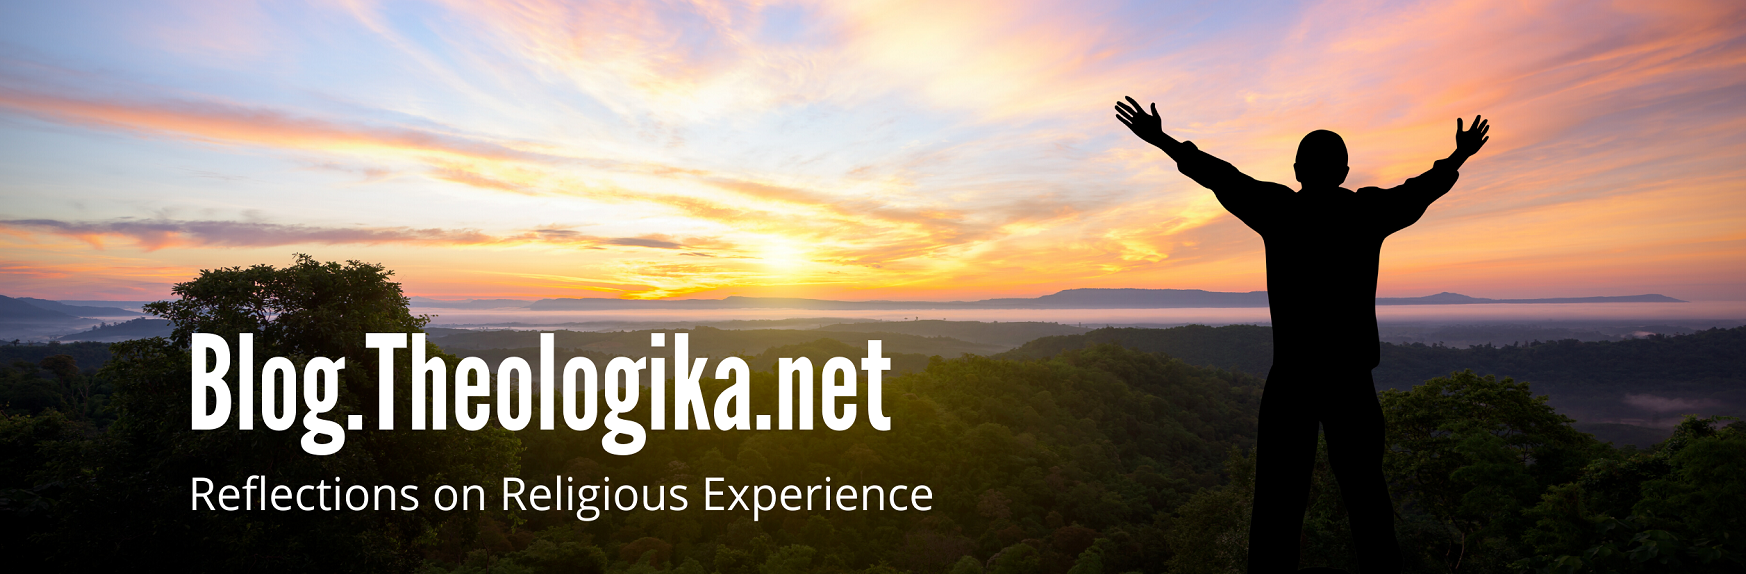 blog.theologika.net